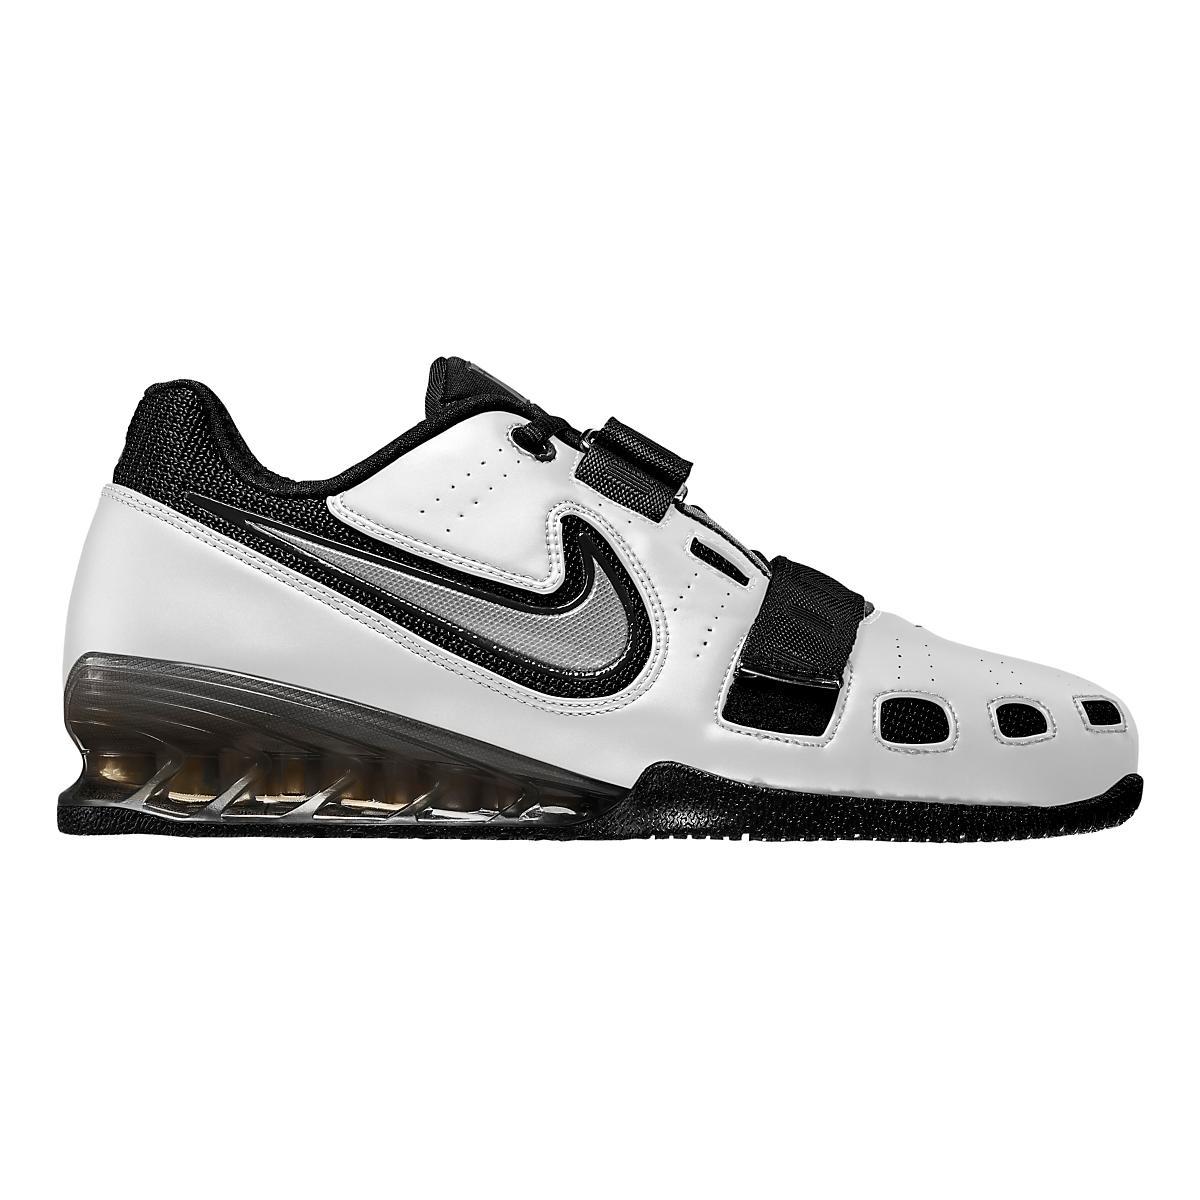 premium selection ceb13 bcf13 Mens Nike Romaleos II Power Lifting Cross Training Shoe at Road Runner  Sports